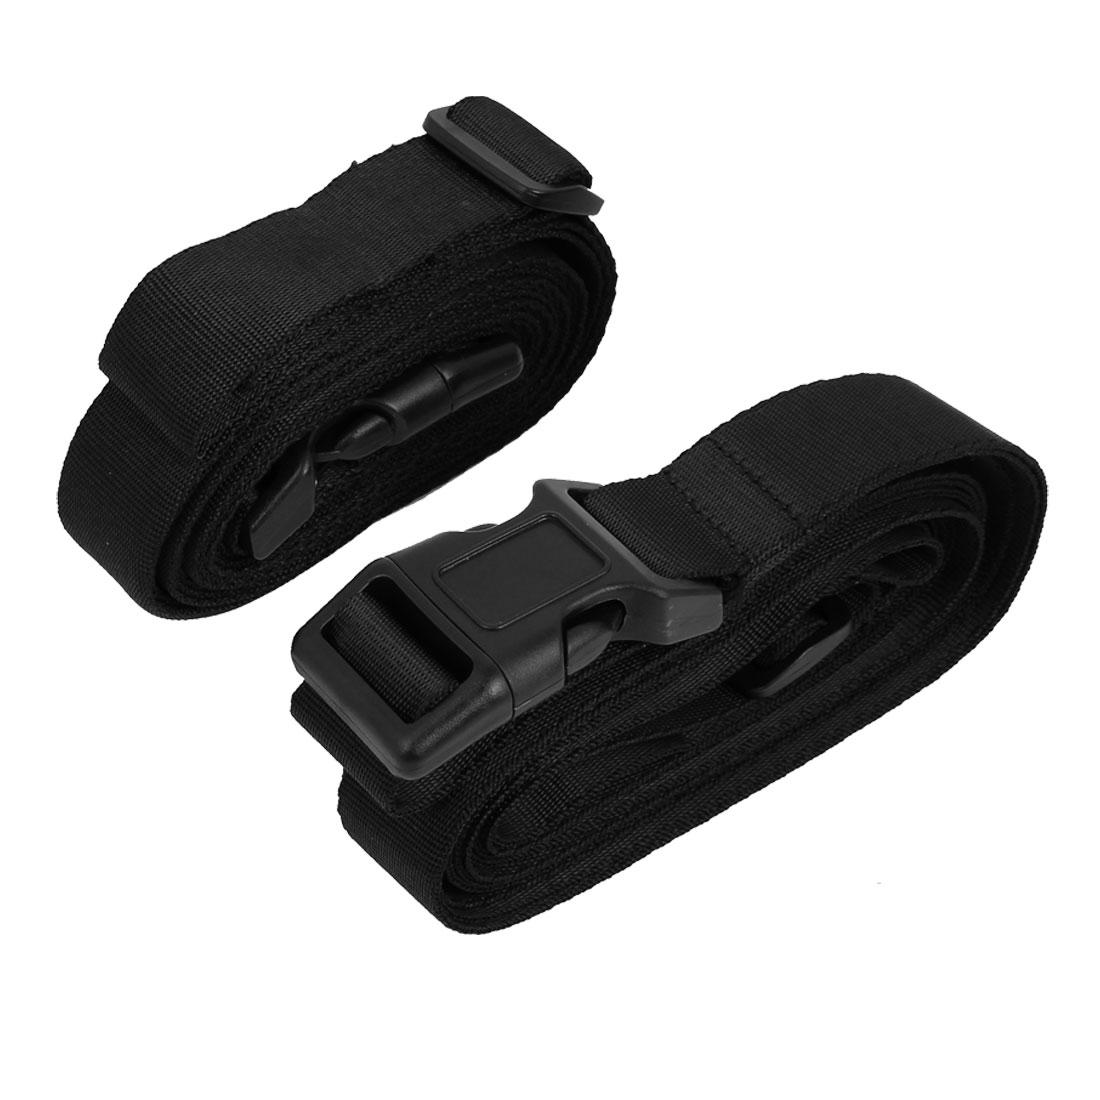 Quick Release Buckle Luggage Suitcase Backpack Baggage Adjustable Belt Strap Black 2Pcs